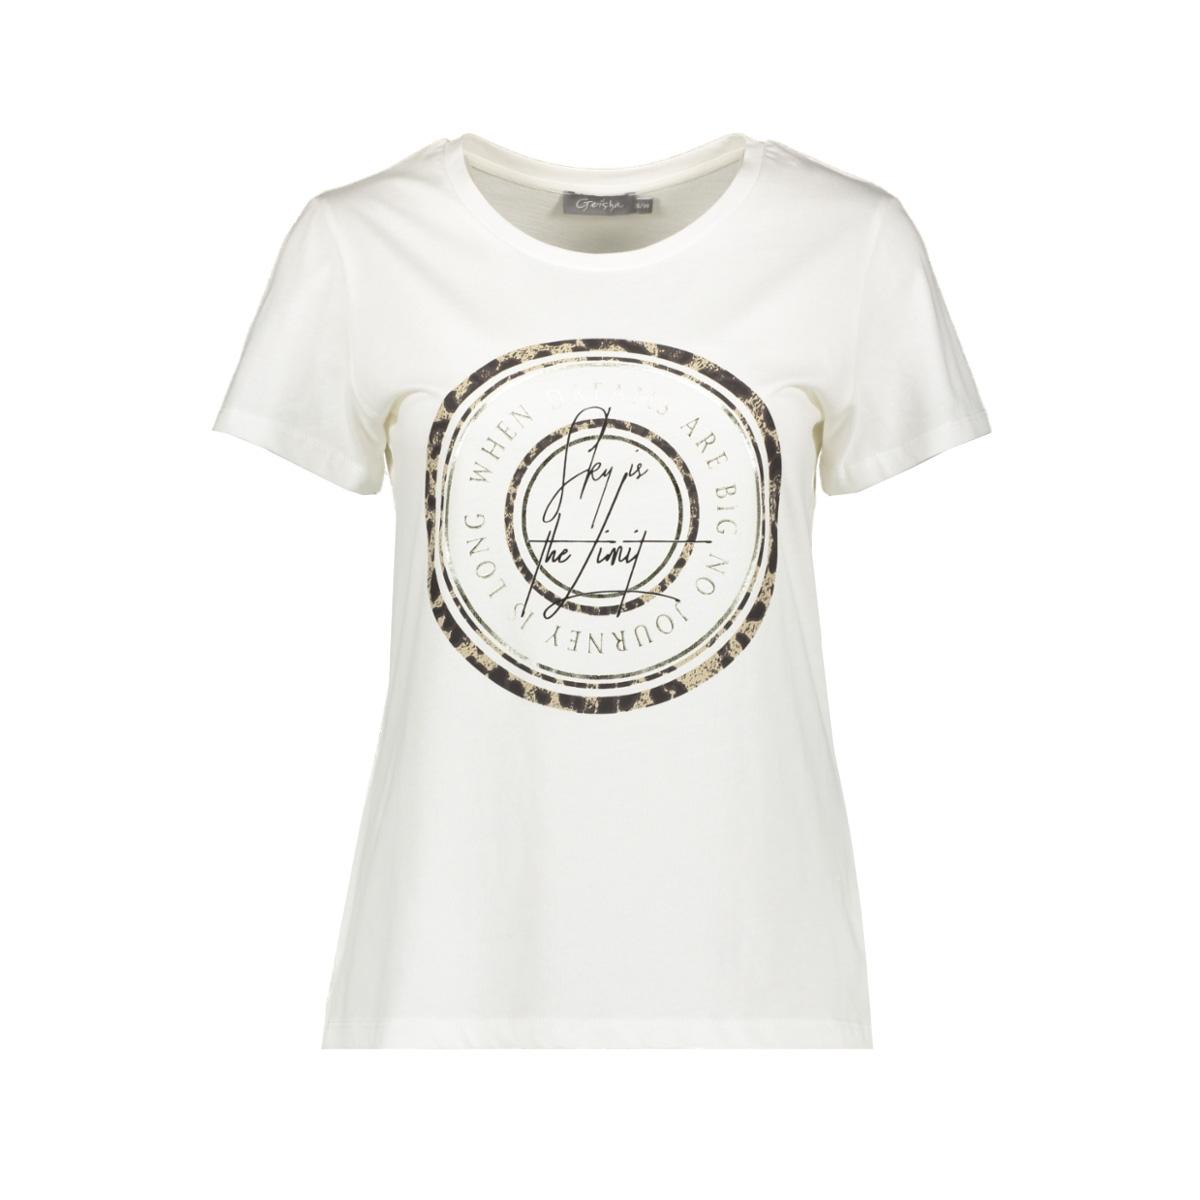 t-shirt  02065 41 geisha t-shirt off-white